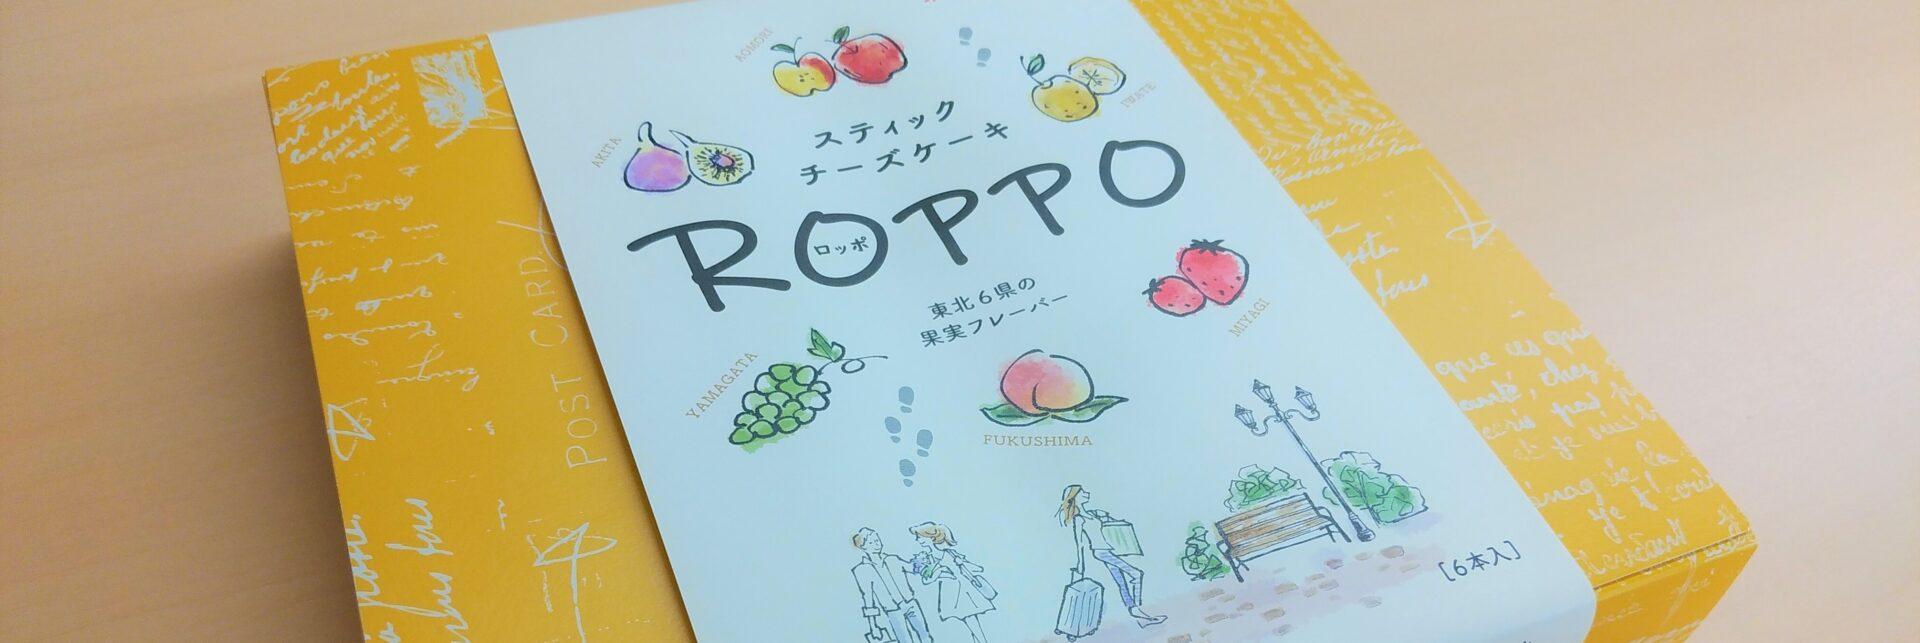 yuzuki様とのコラボ商品「ROPPO」(ロッポ)、数量限定販売中!